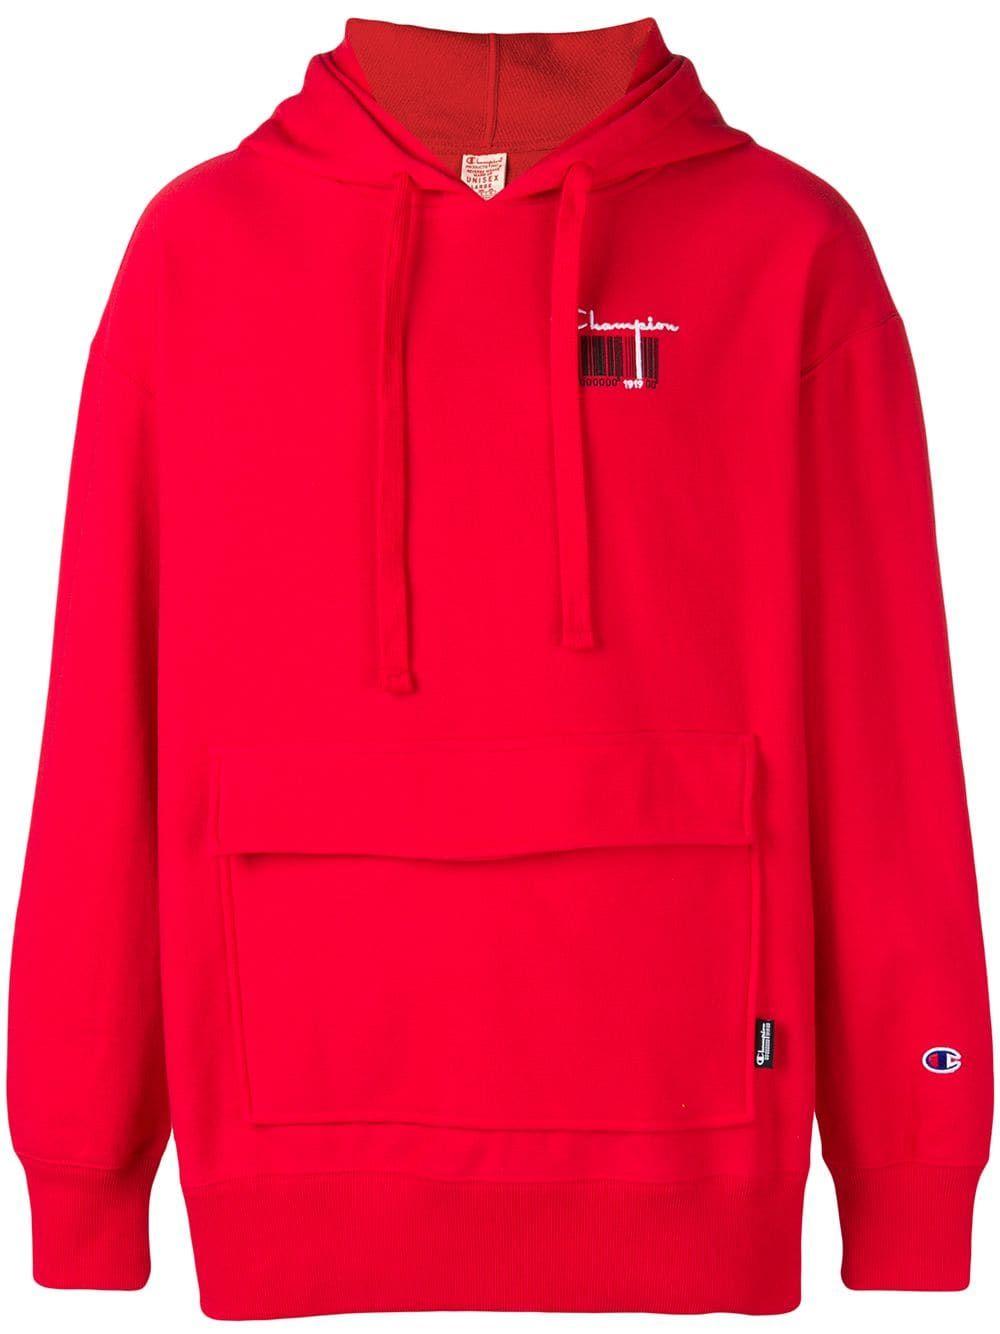 011a59c6994e CHAMPION CHAMPION CONTRAST LOGO HOODIE - RED.  champion  cloth ...